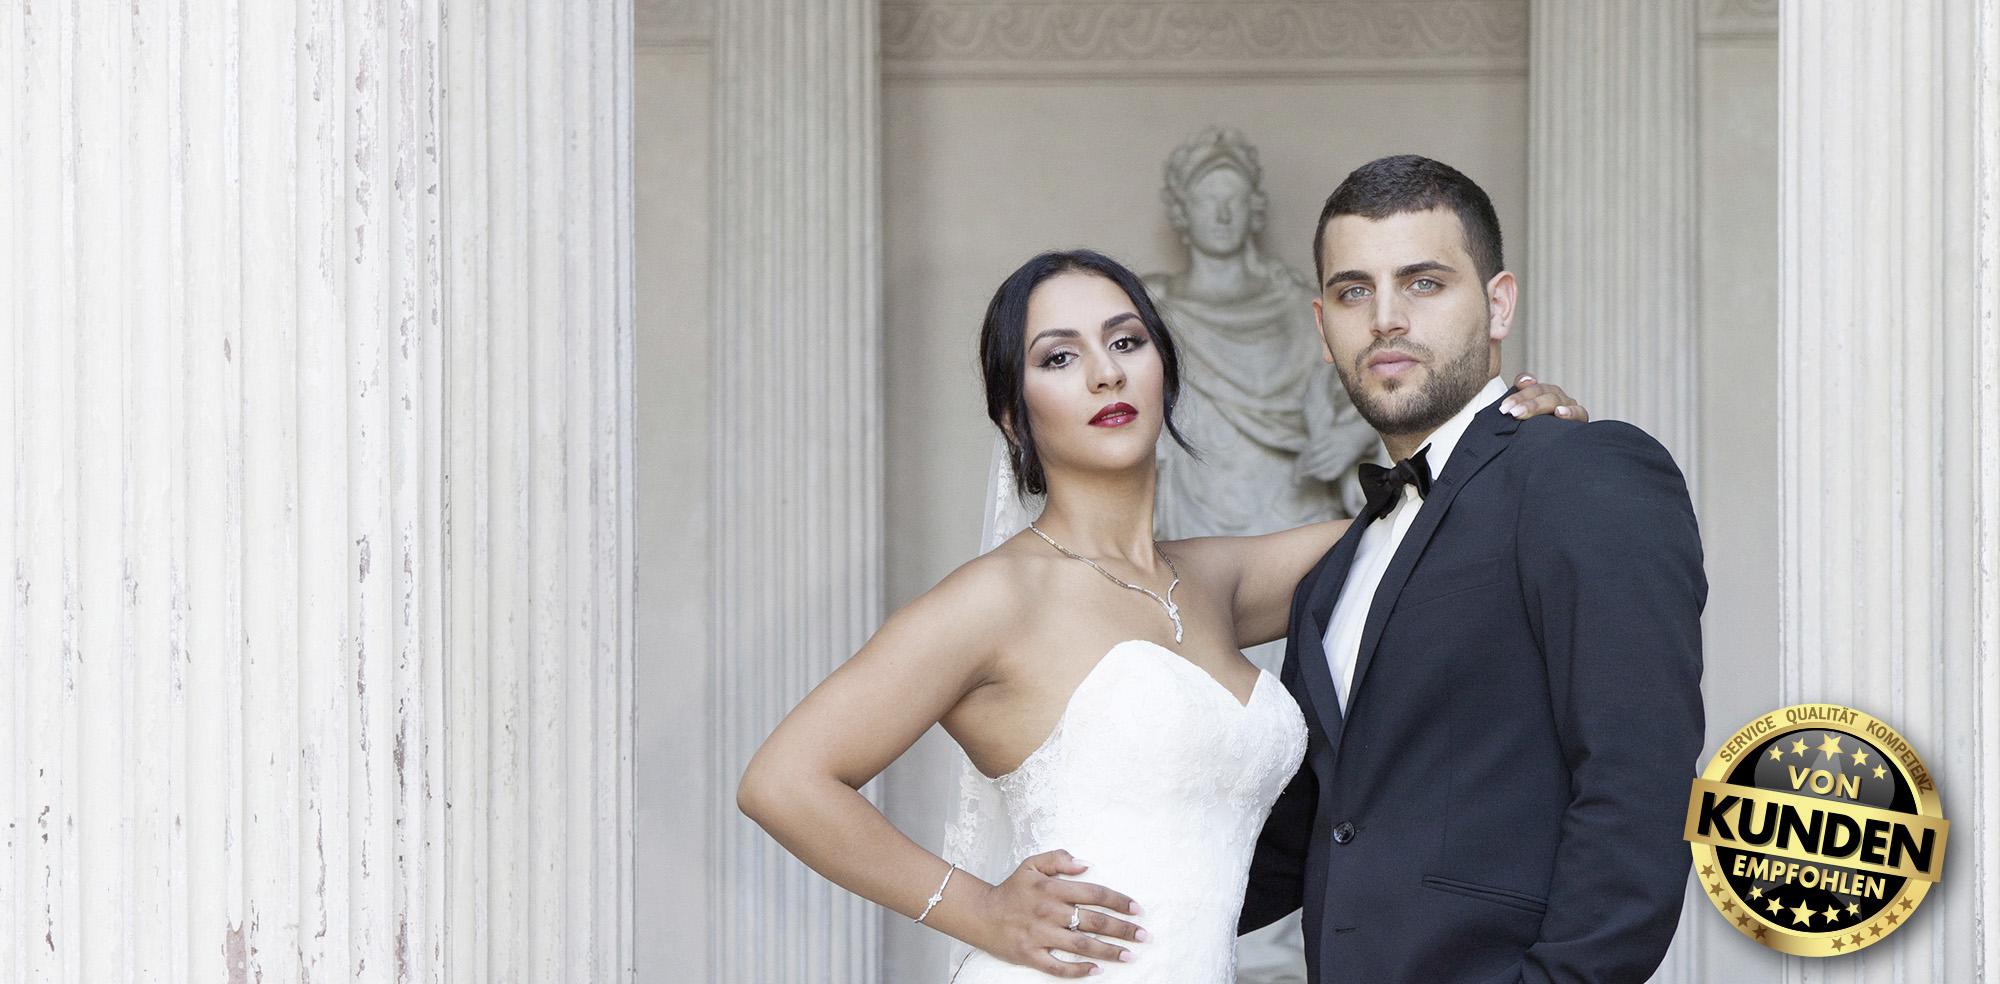 Hochzeitsfotografie@blickfang2_fotostudios_filmstudios